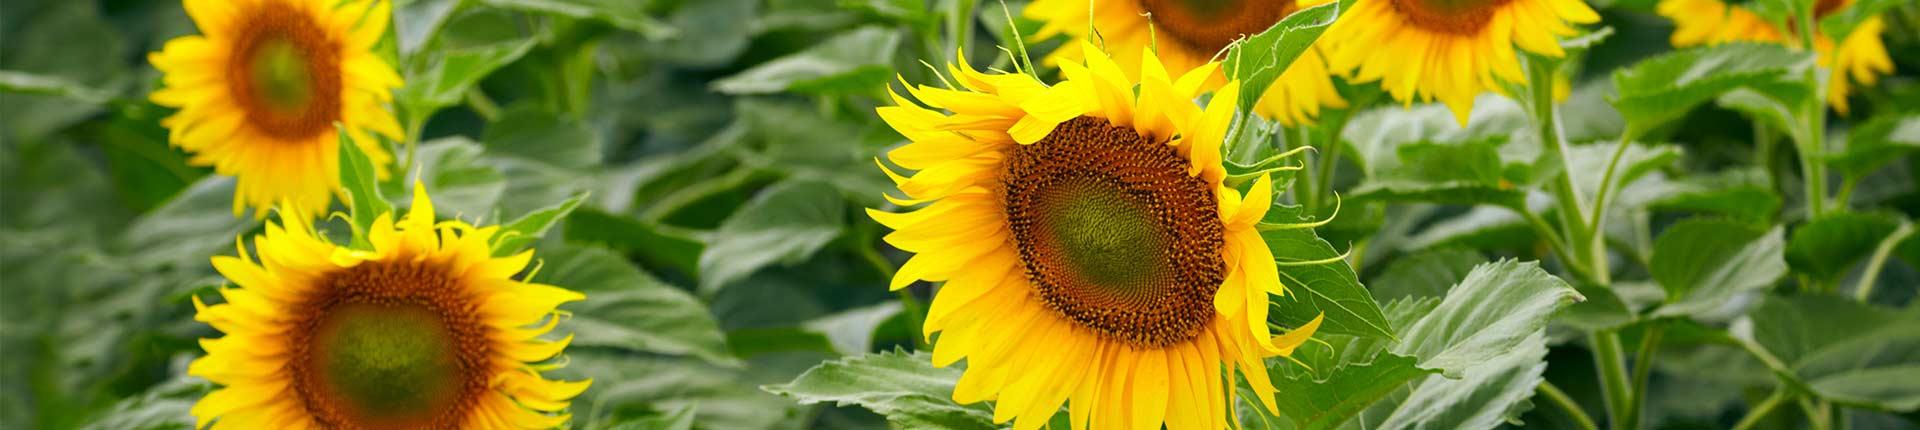 sonnenblumen1